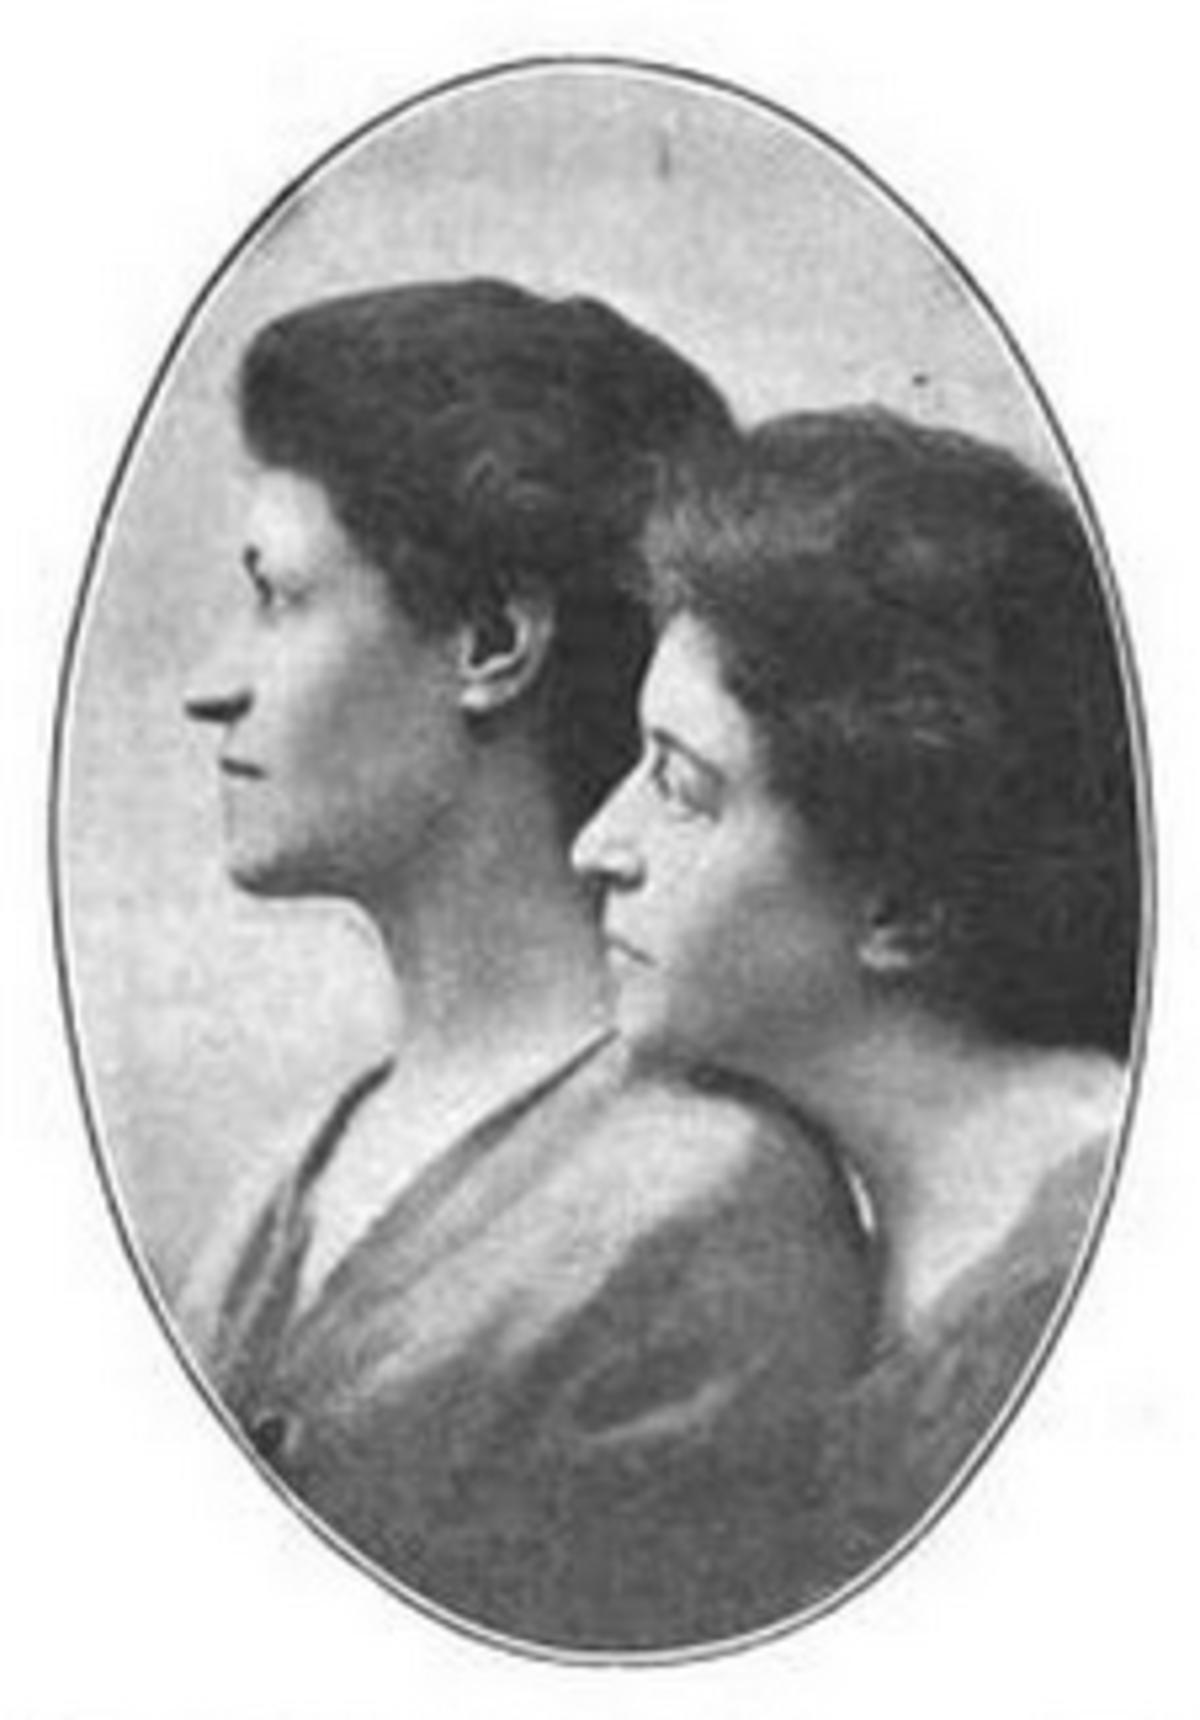 rose and ottilie sutro wikipedia